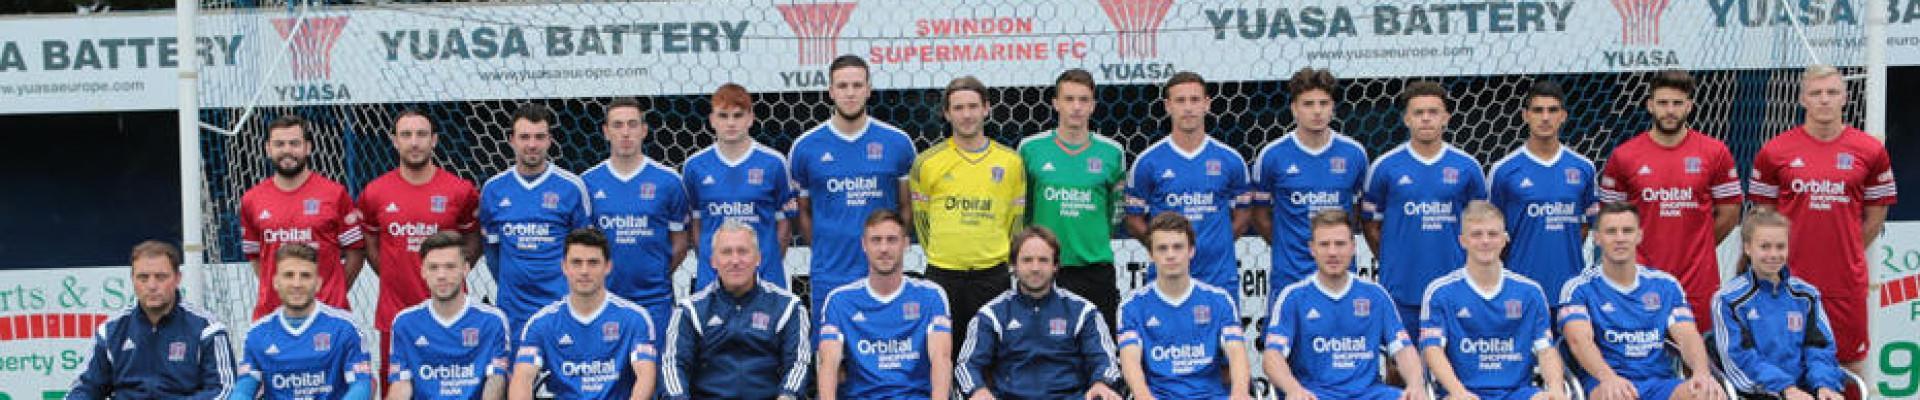 Team Photo 2015/16 Season